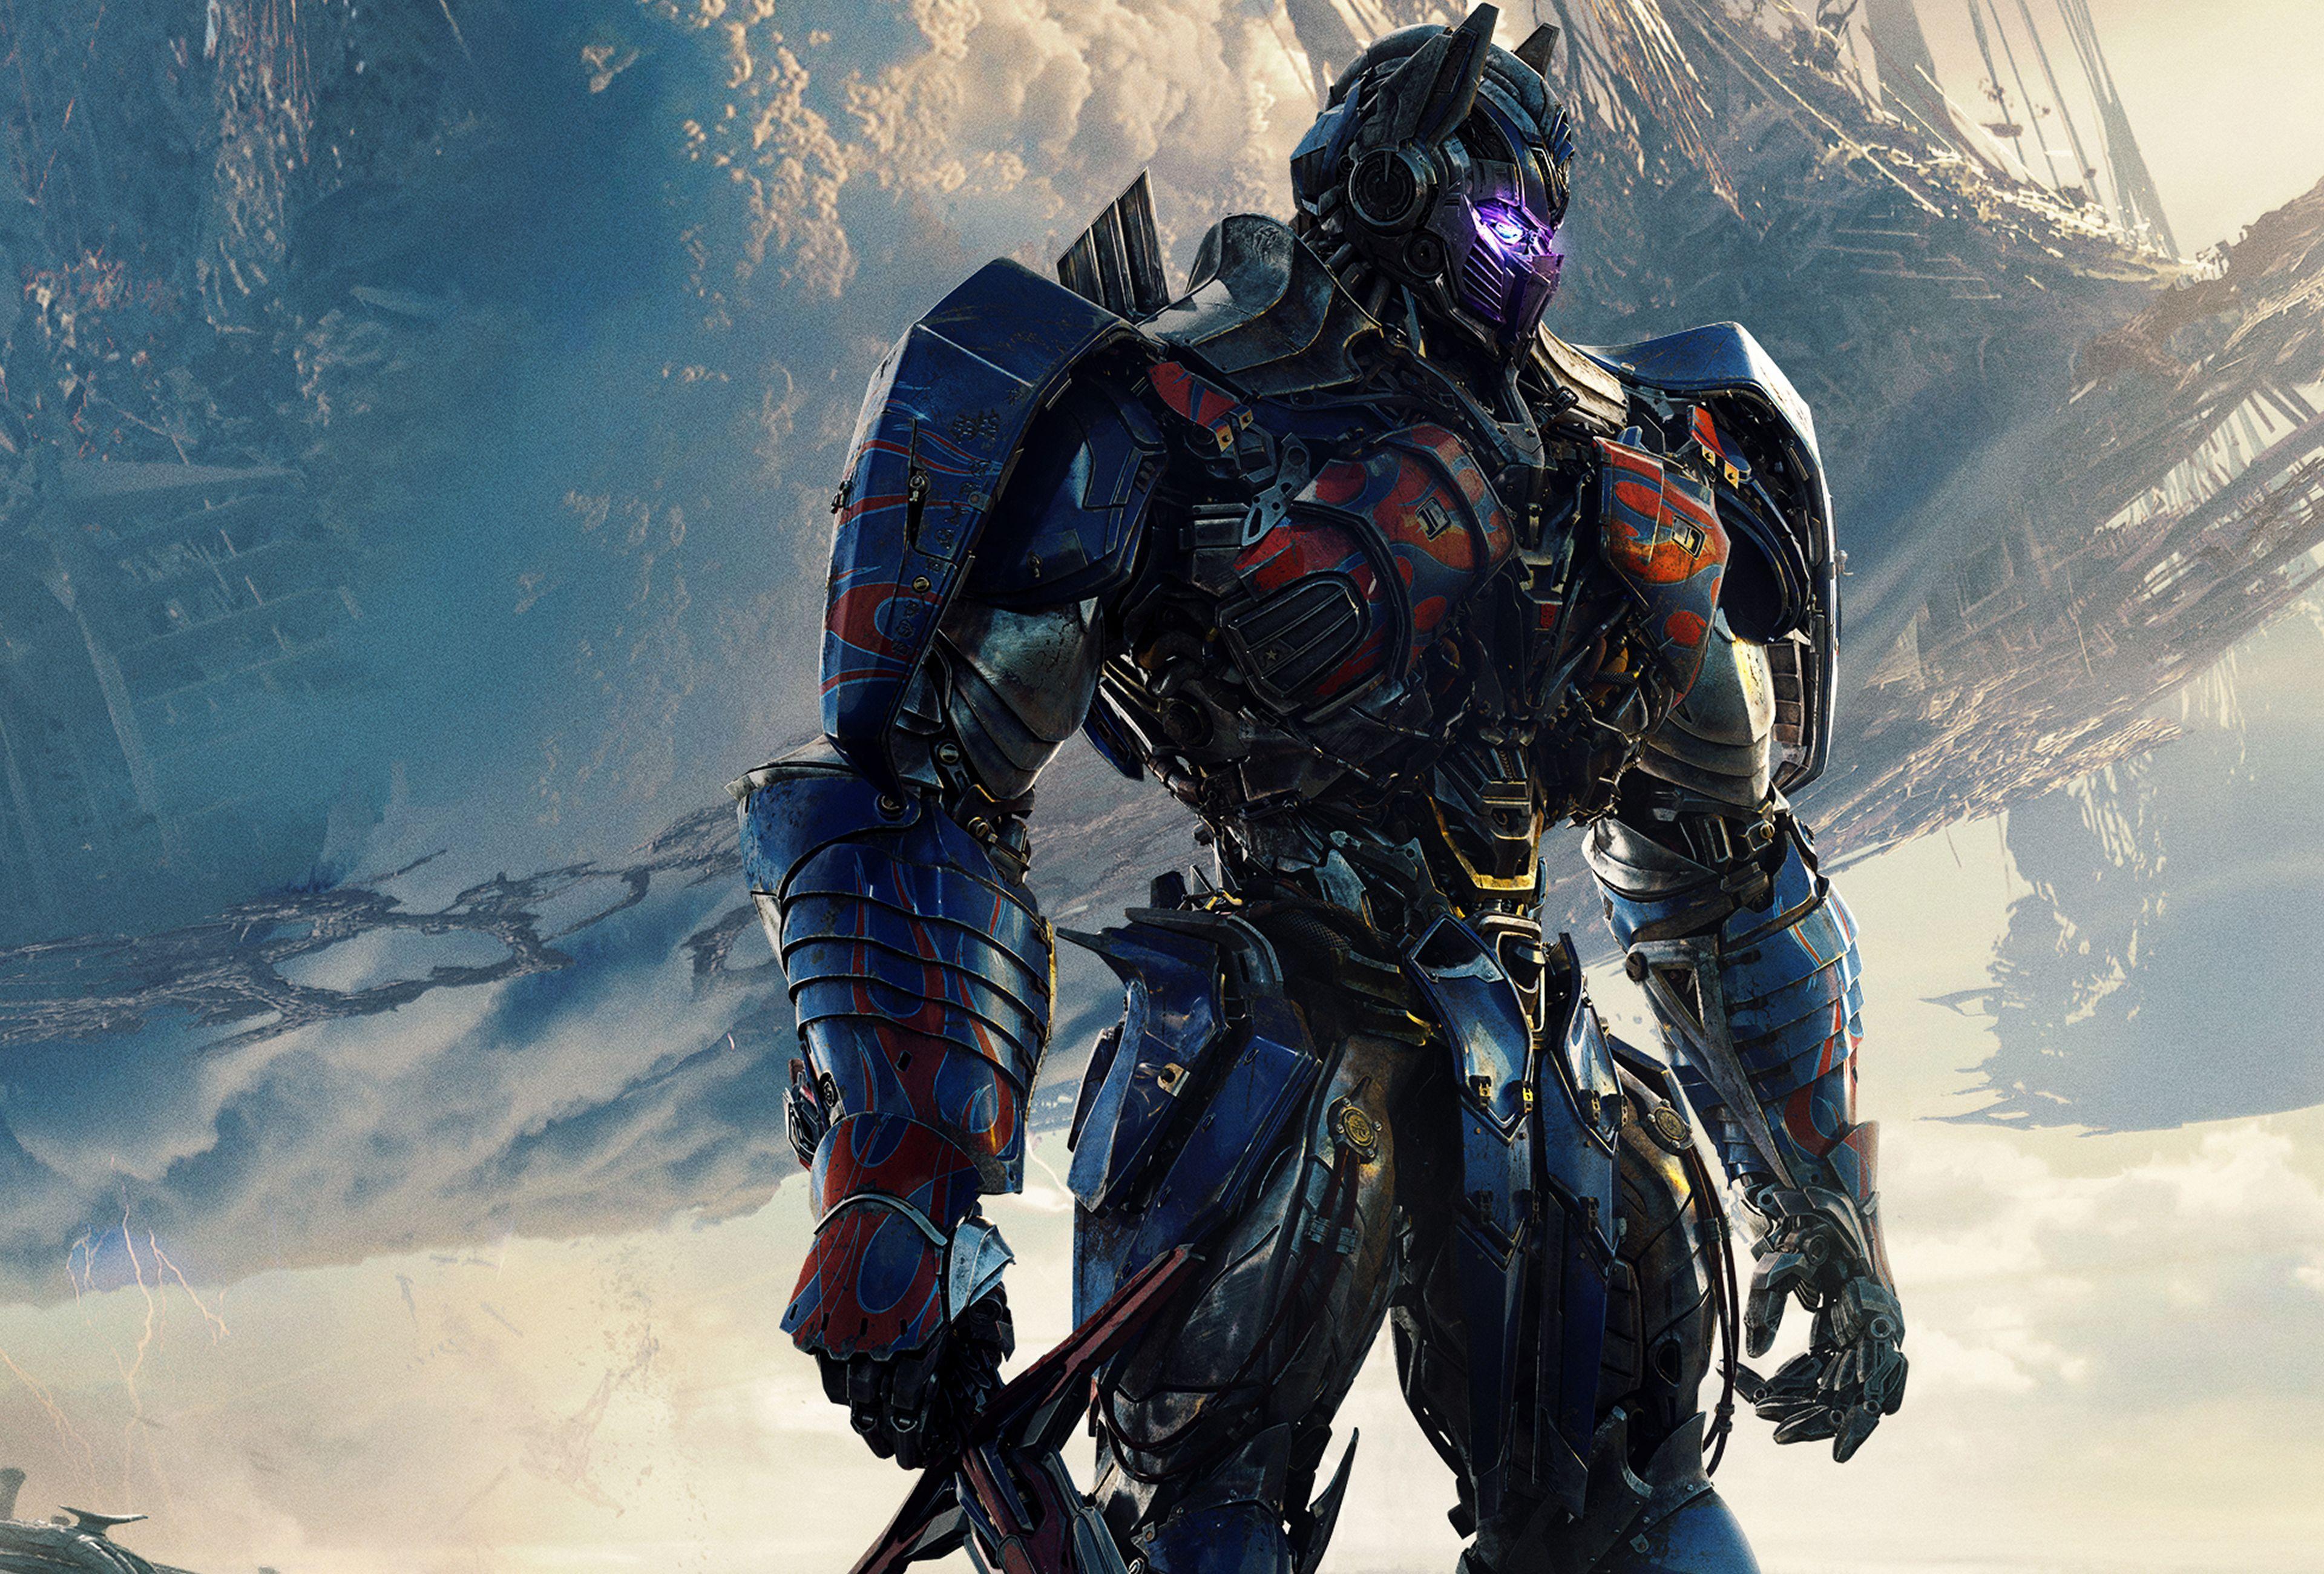 Transformer Optimus Prime Hd Wallpapers Top Free Transformer